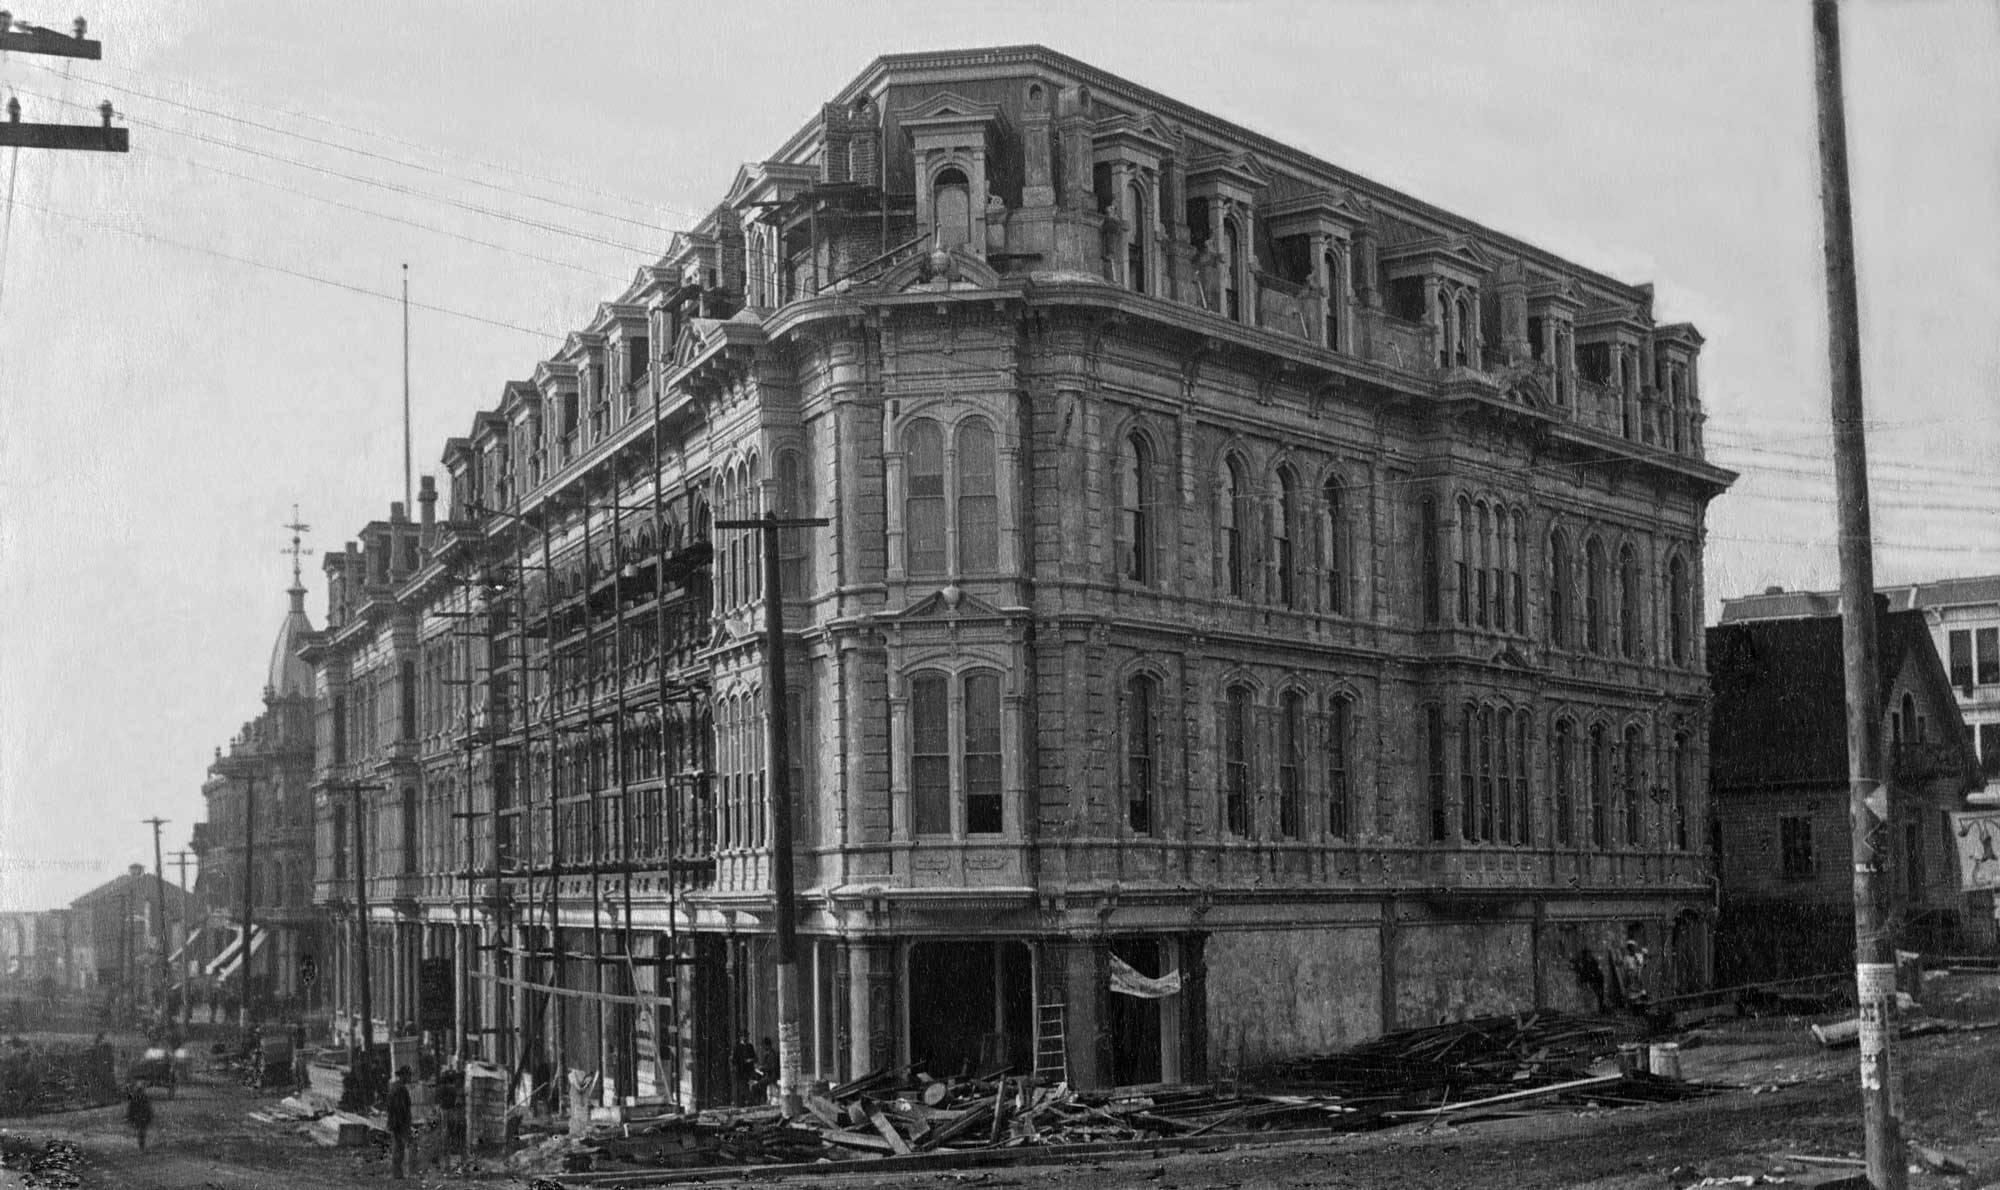 occidental-hotel-1887-then-mr.jpg